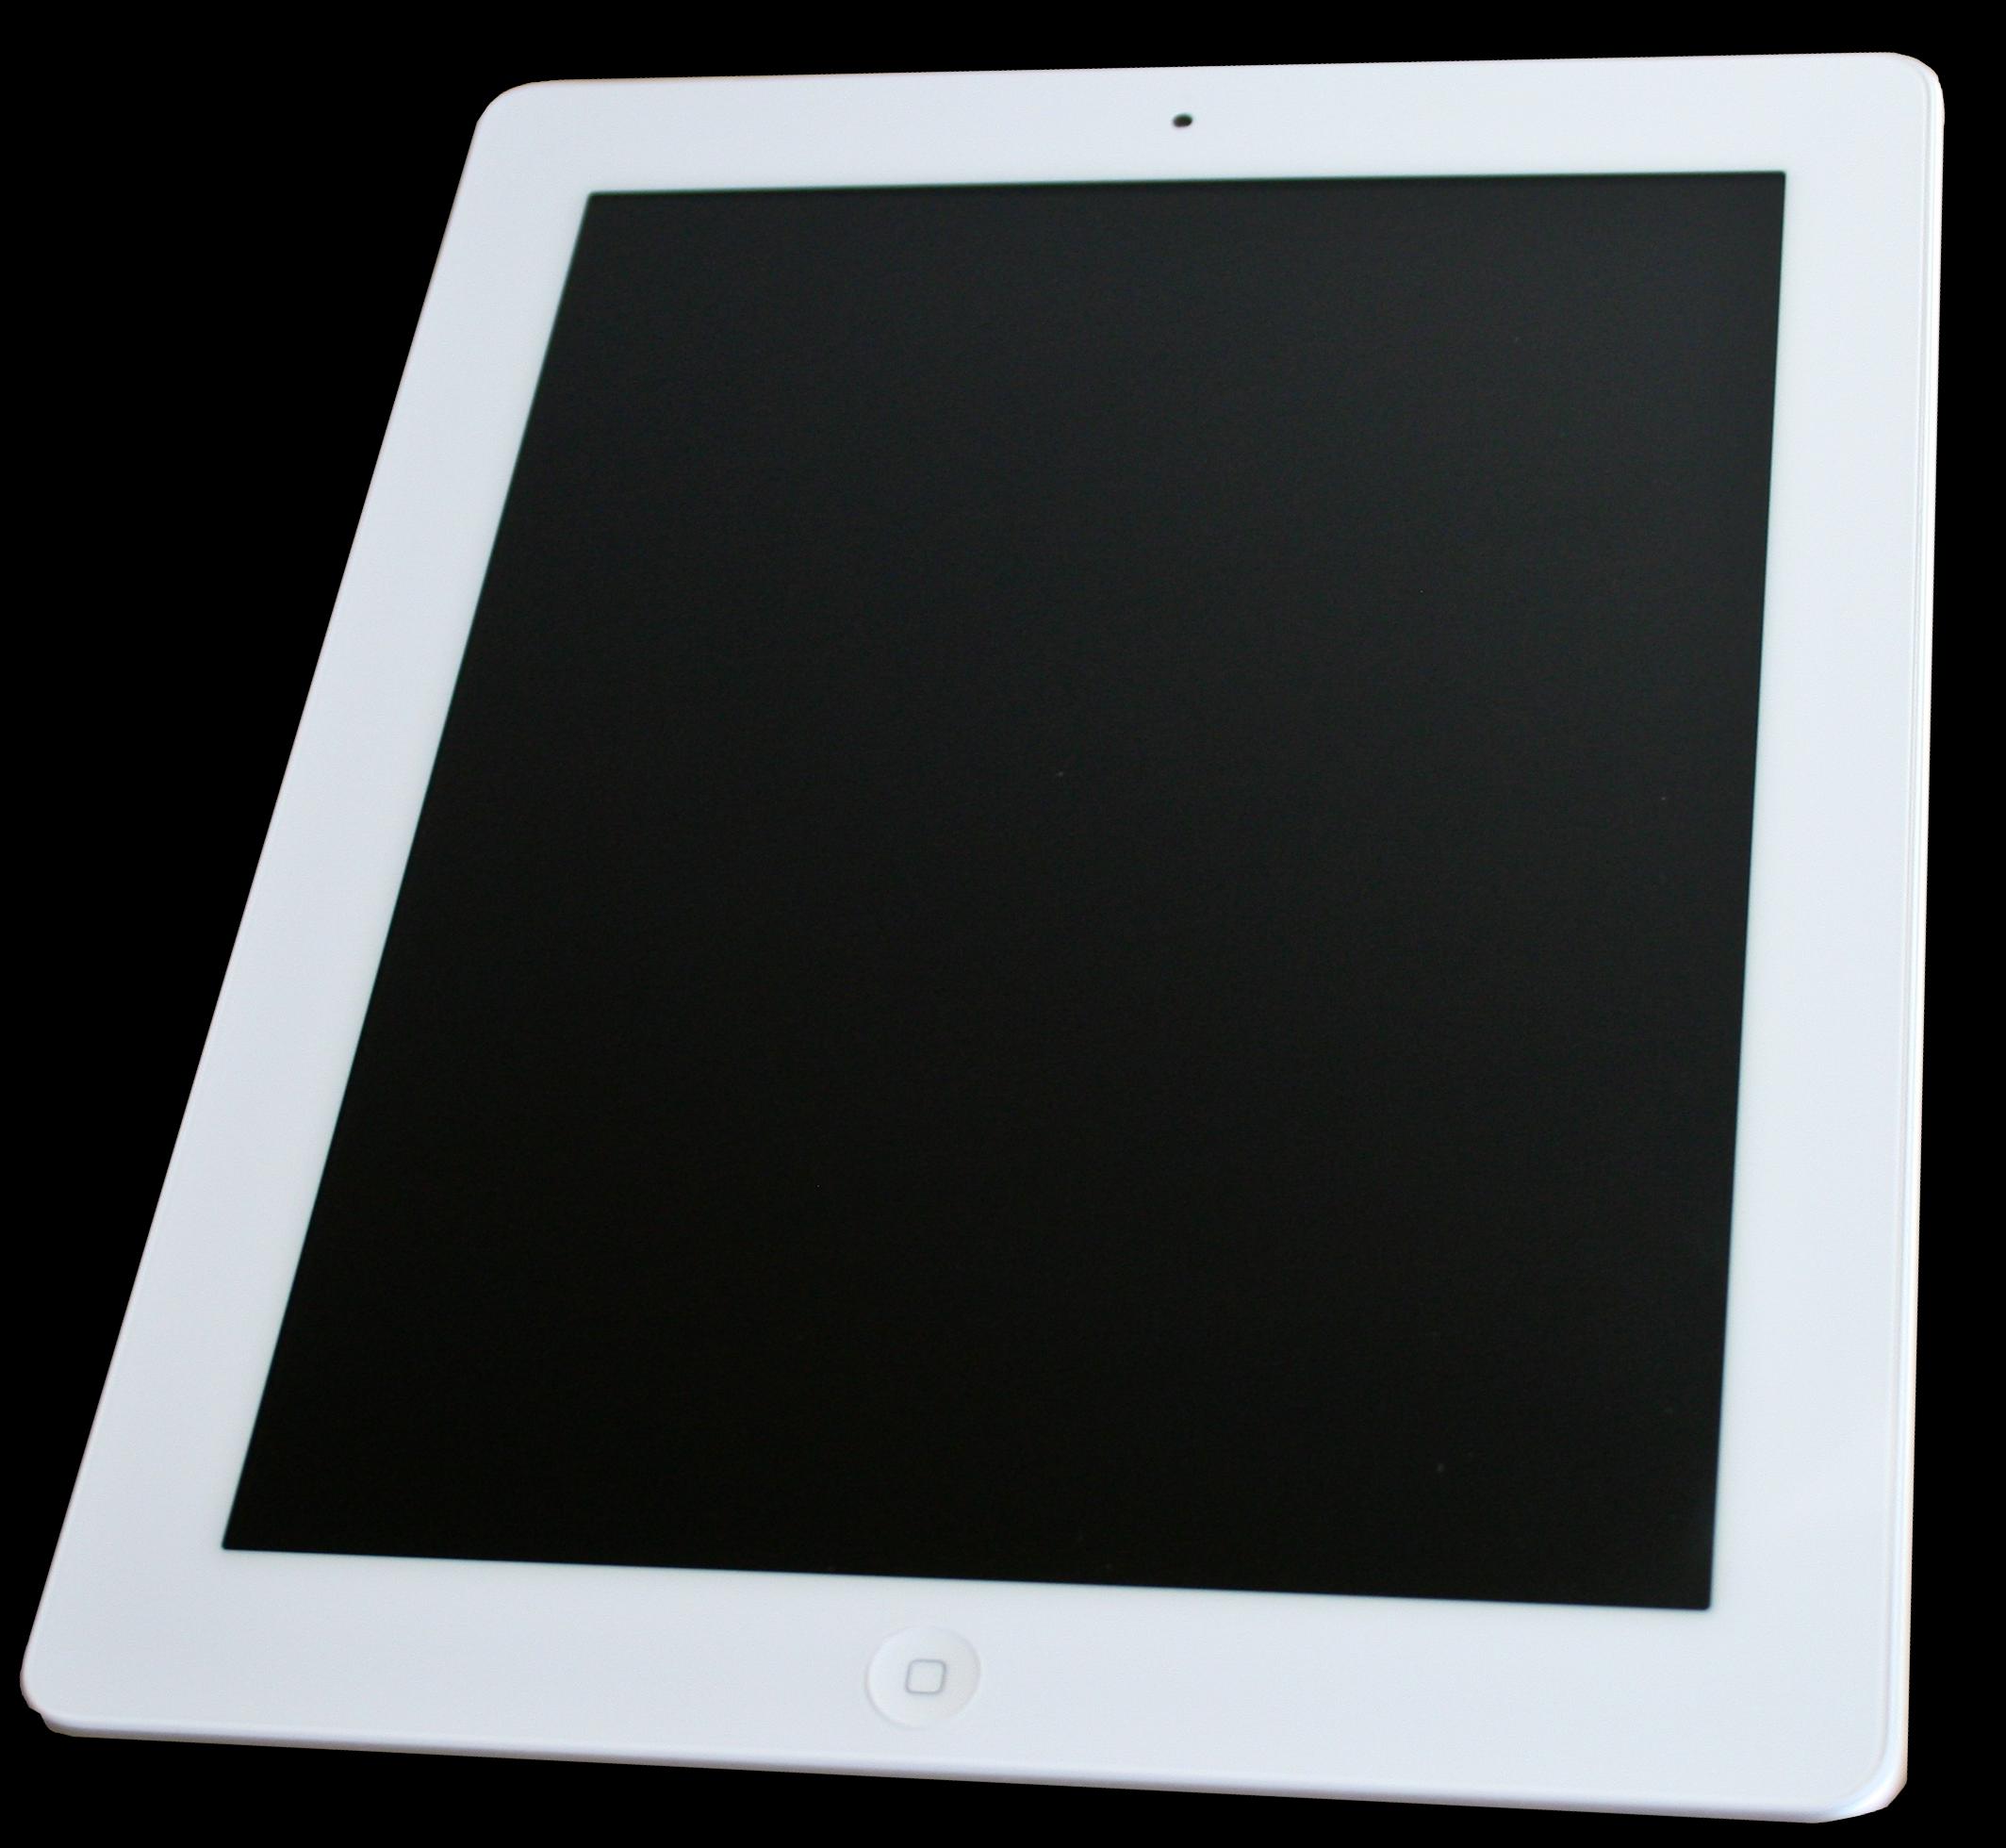 iPad 2 - Wikipedia